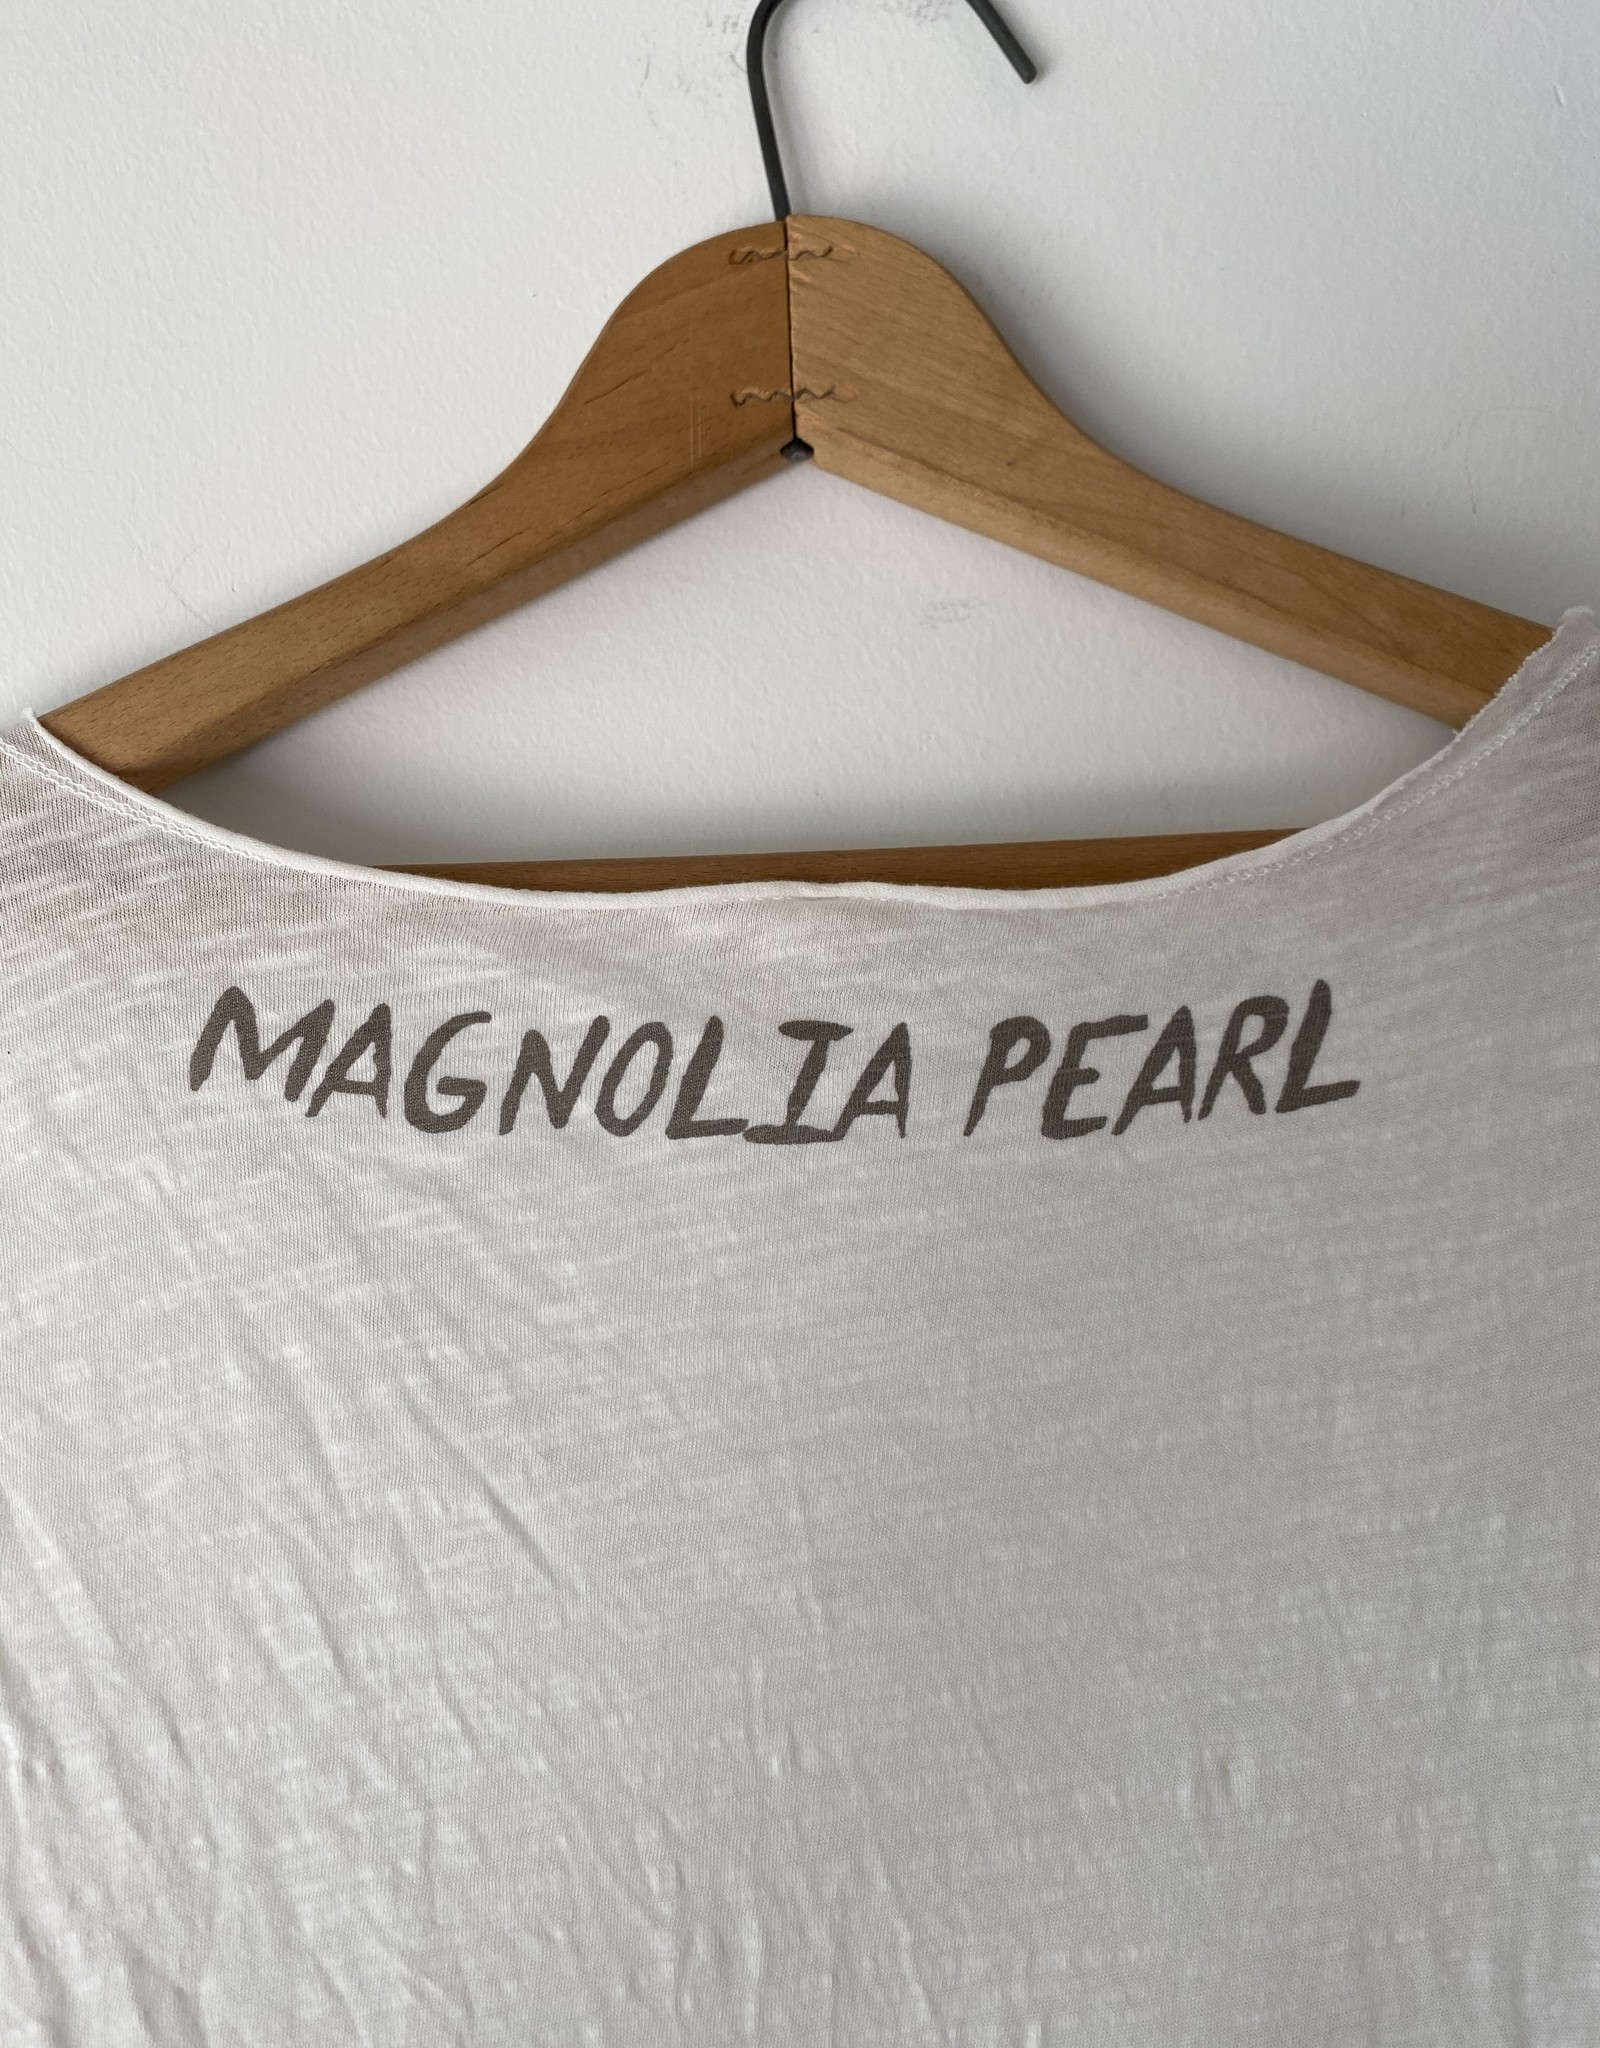 MAGNOLIA PEARL MAGNOLIA PEARL DRESS 520